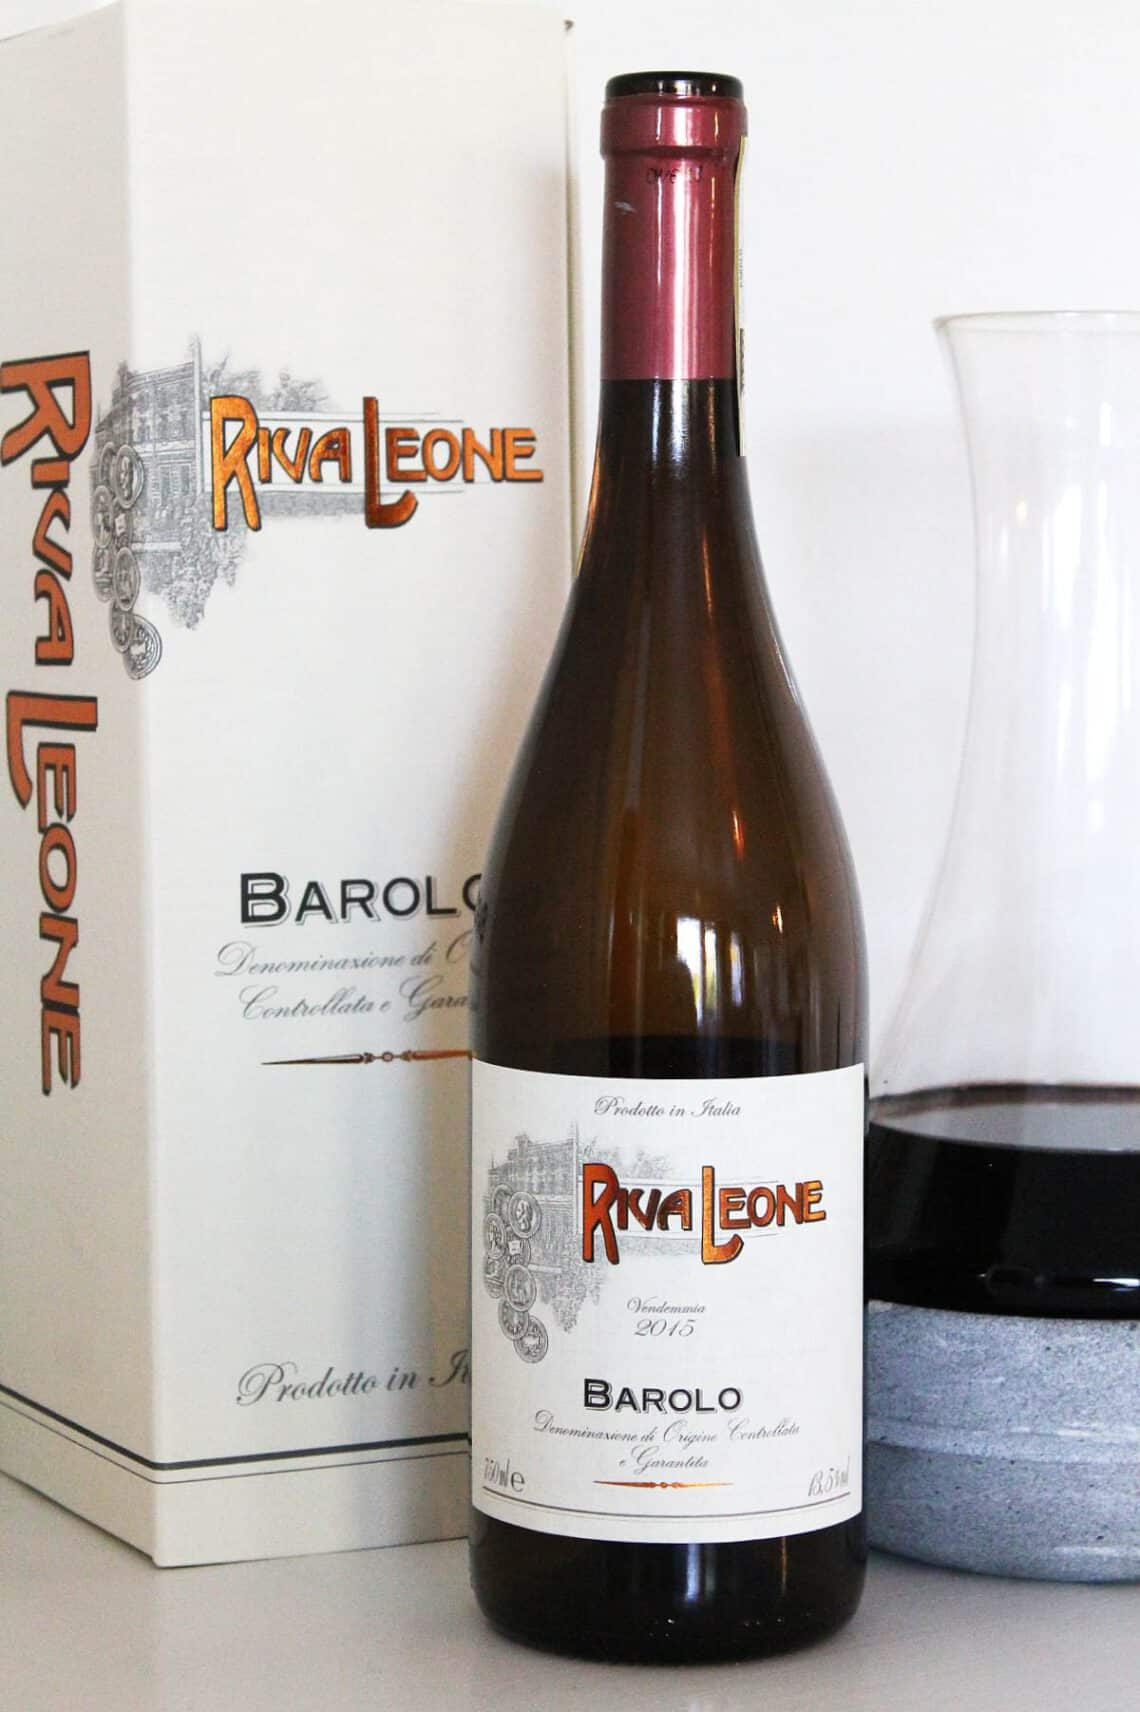 Lokakuun 2020 viiniuutuus -Riva Leone Barolo 2015